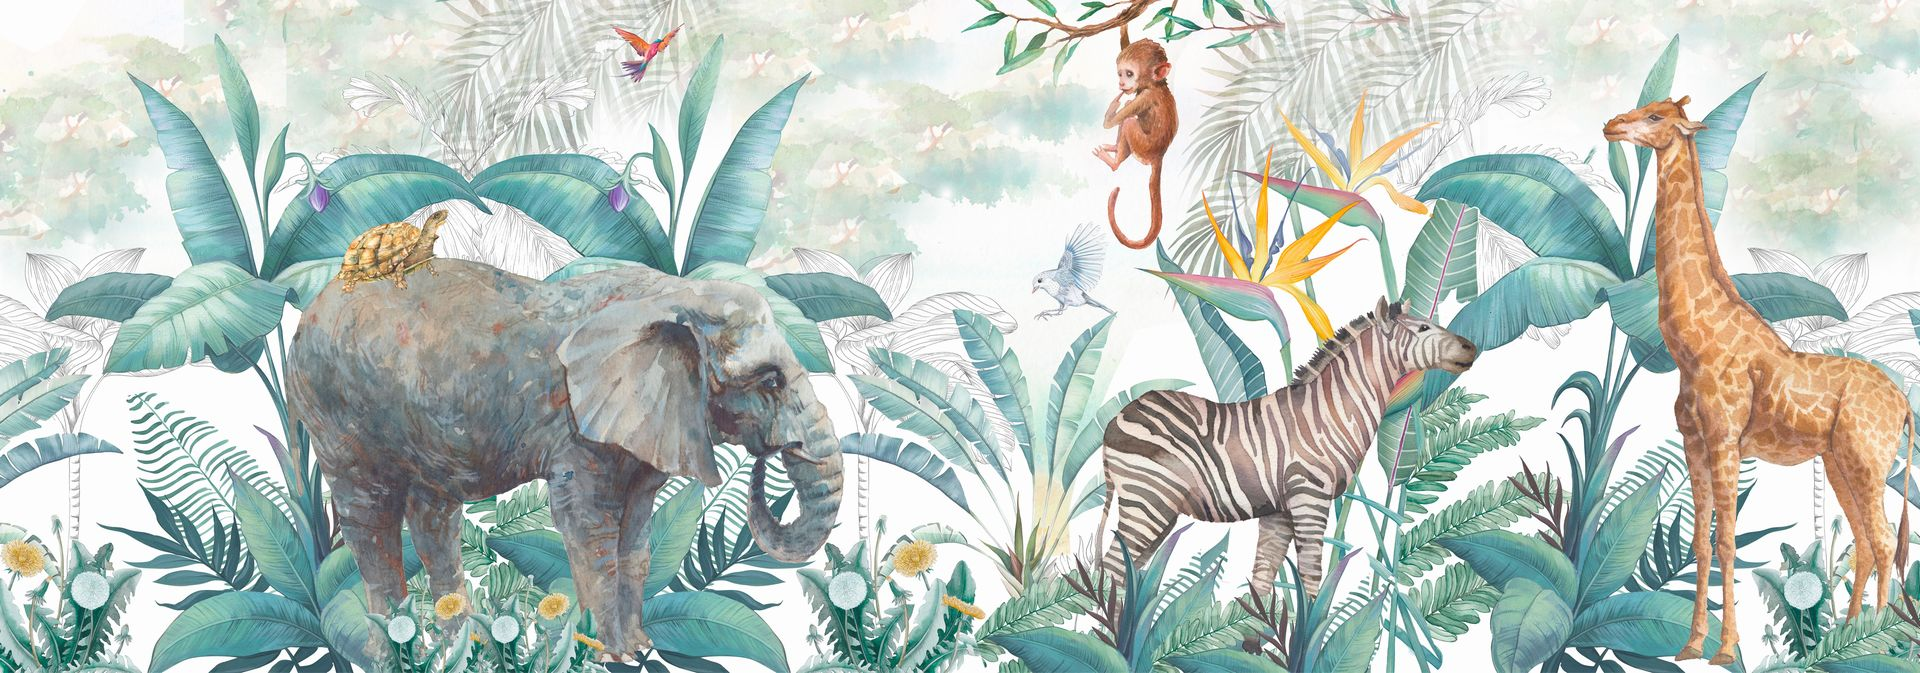 Nuevo mural Safari Africa